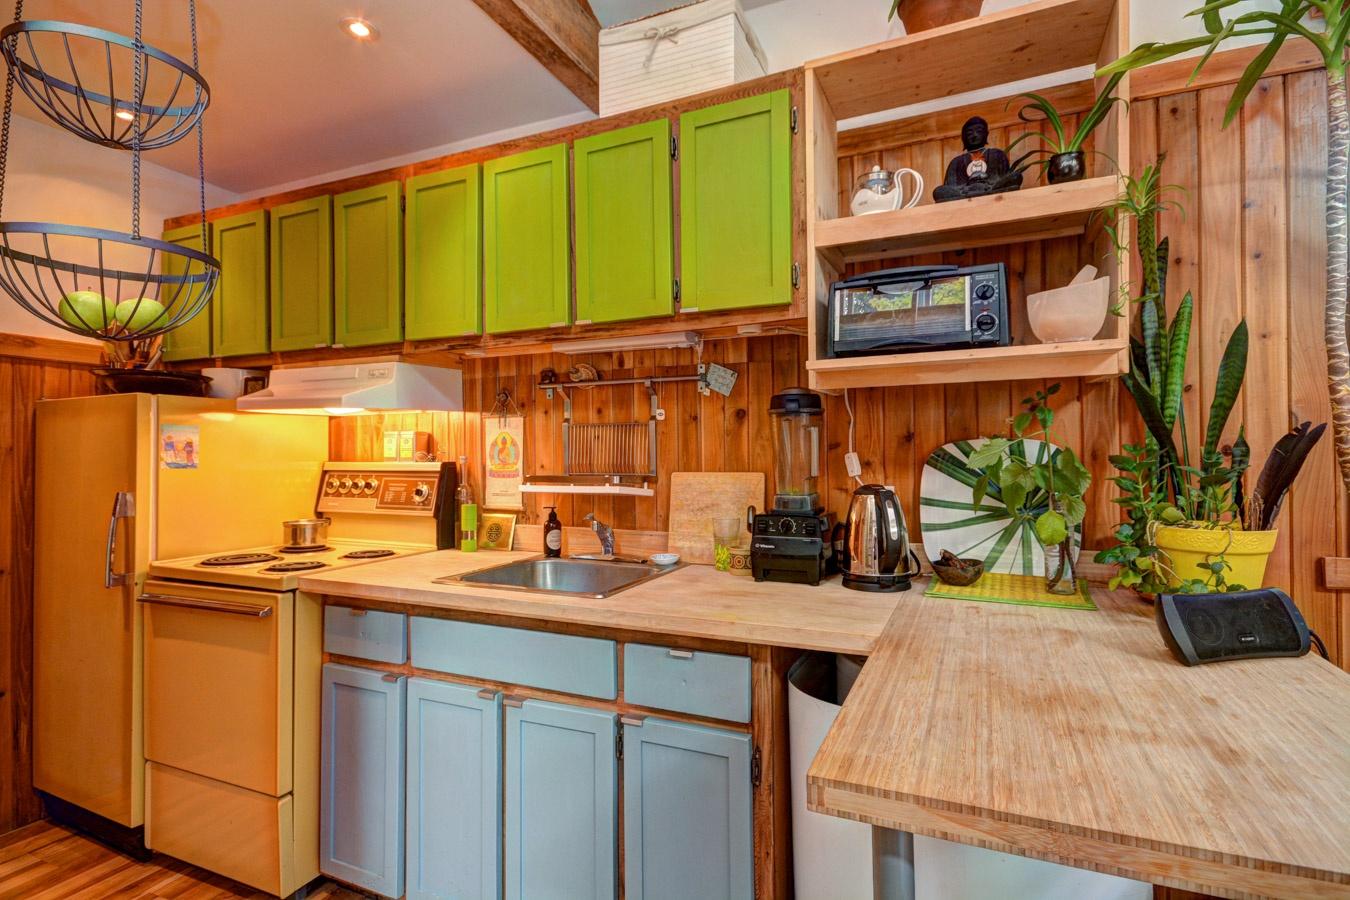 maison en bois a vendre. Black Bedroom Furniture Sets. Home Design Ideas